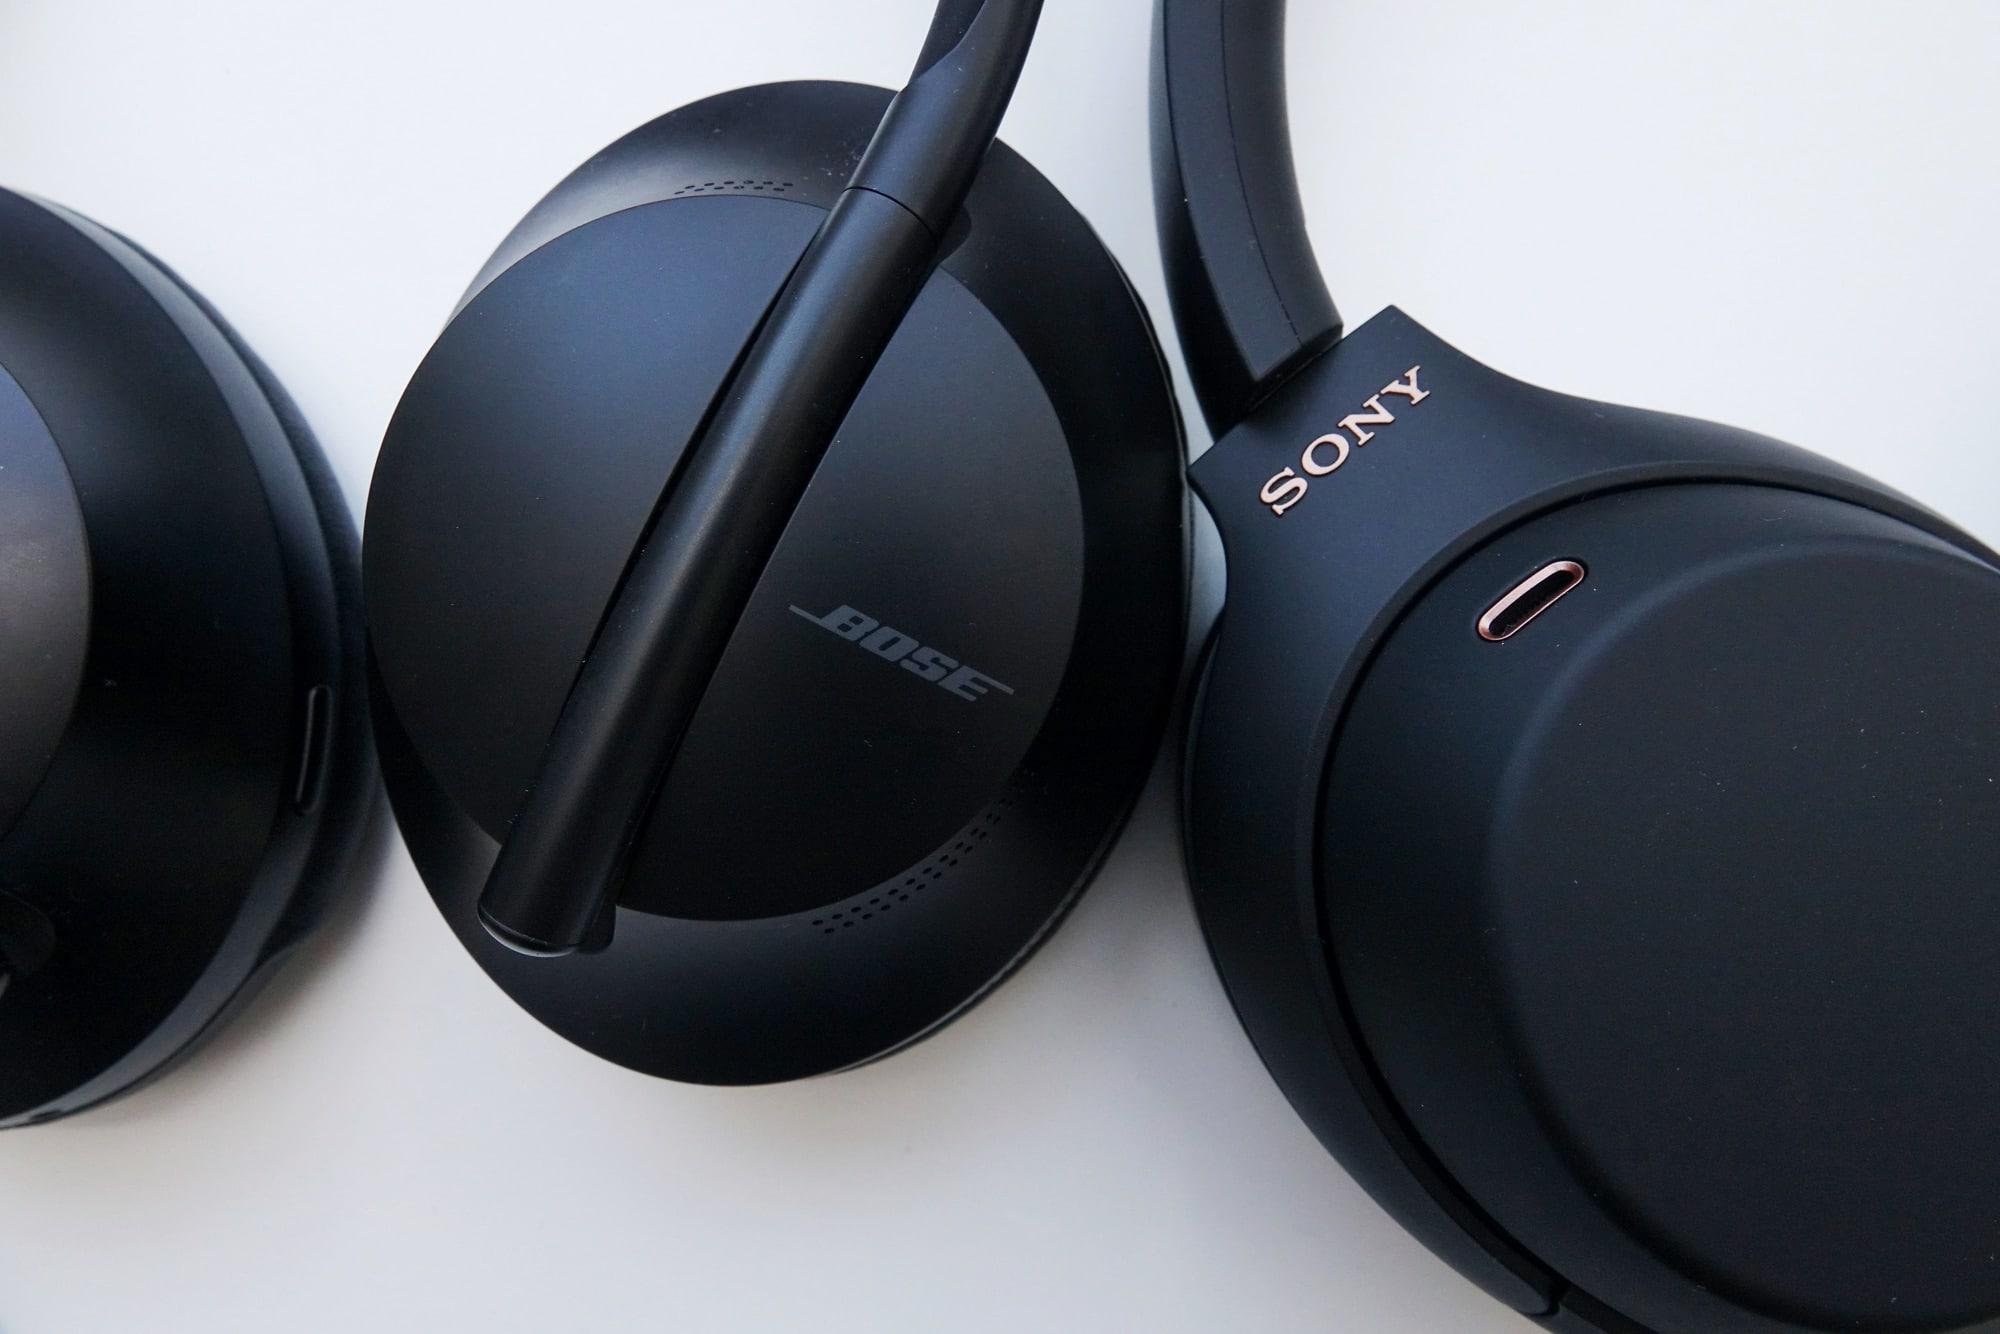 Bose 700 Noise Cancelling Headphones vs Sony WH-1000XM4 Noise Cancelling Headphones